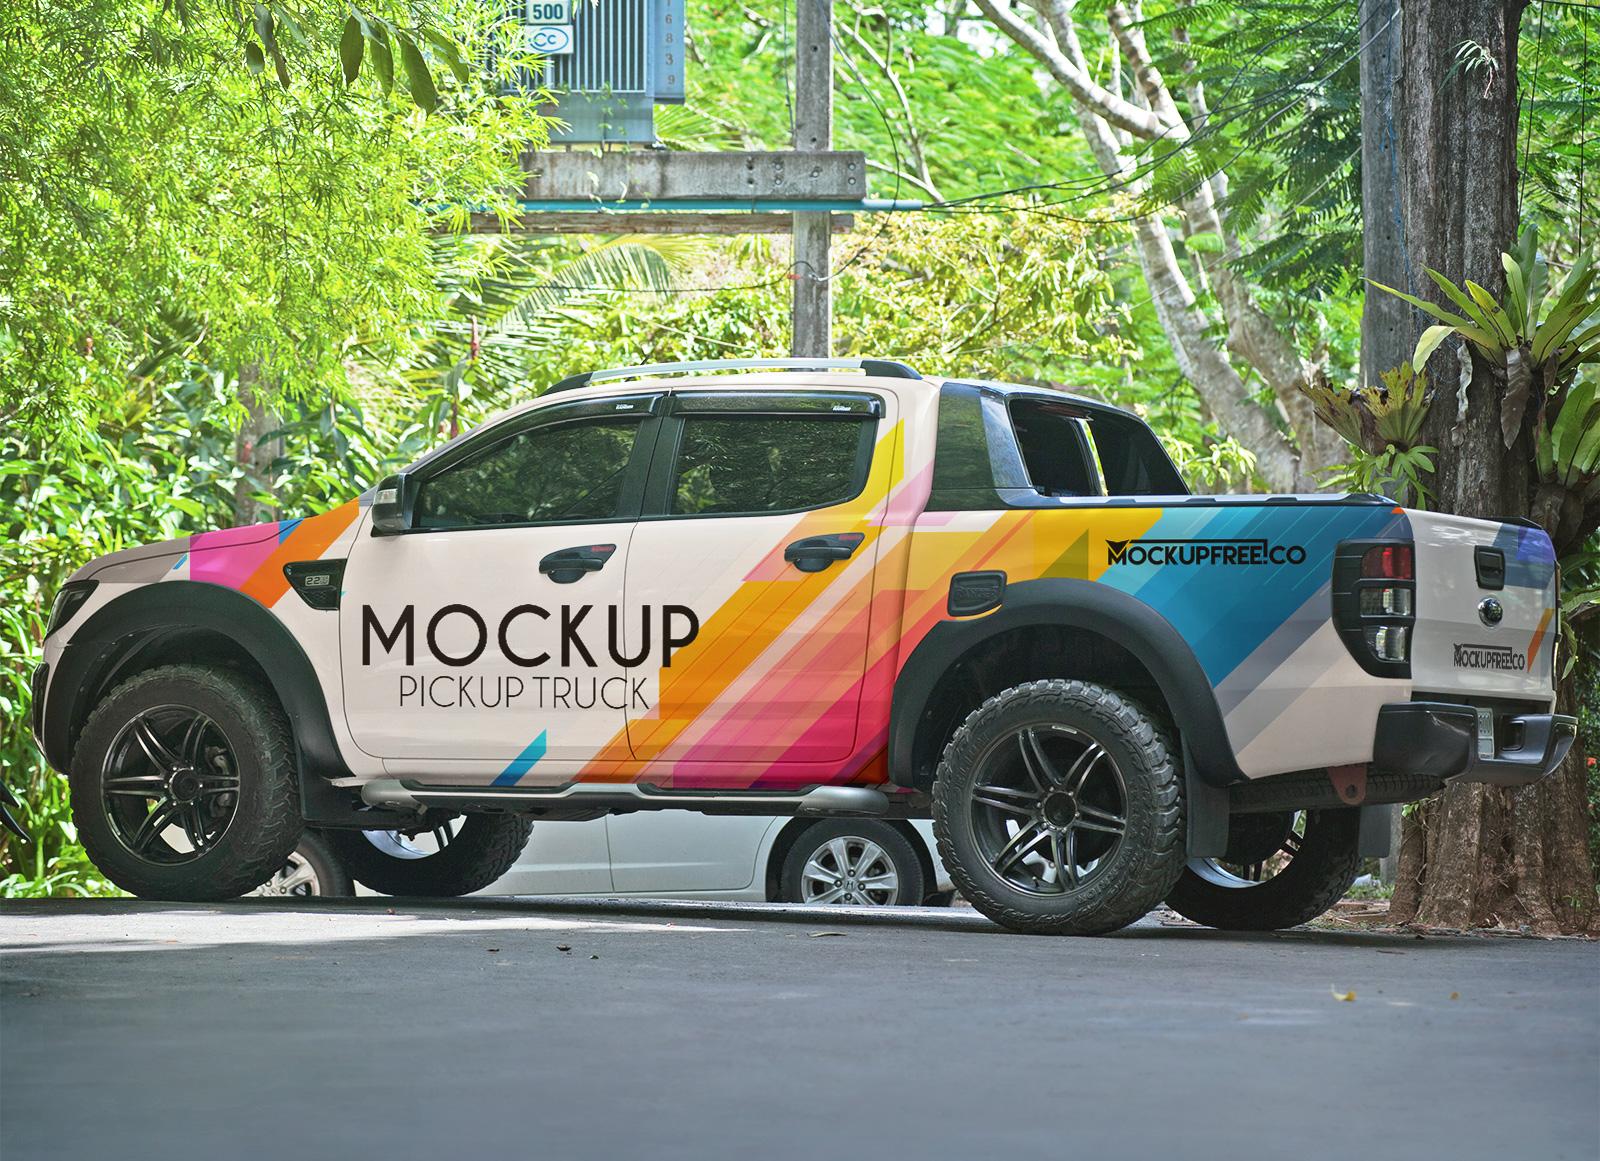 Free-Vehicle-Branding-Pickup-Truck-Mockup-PSD-2